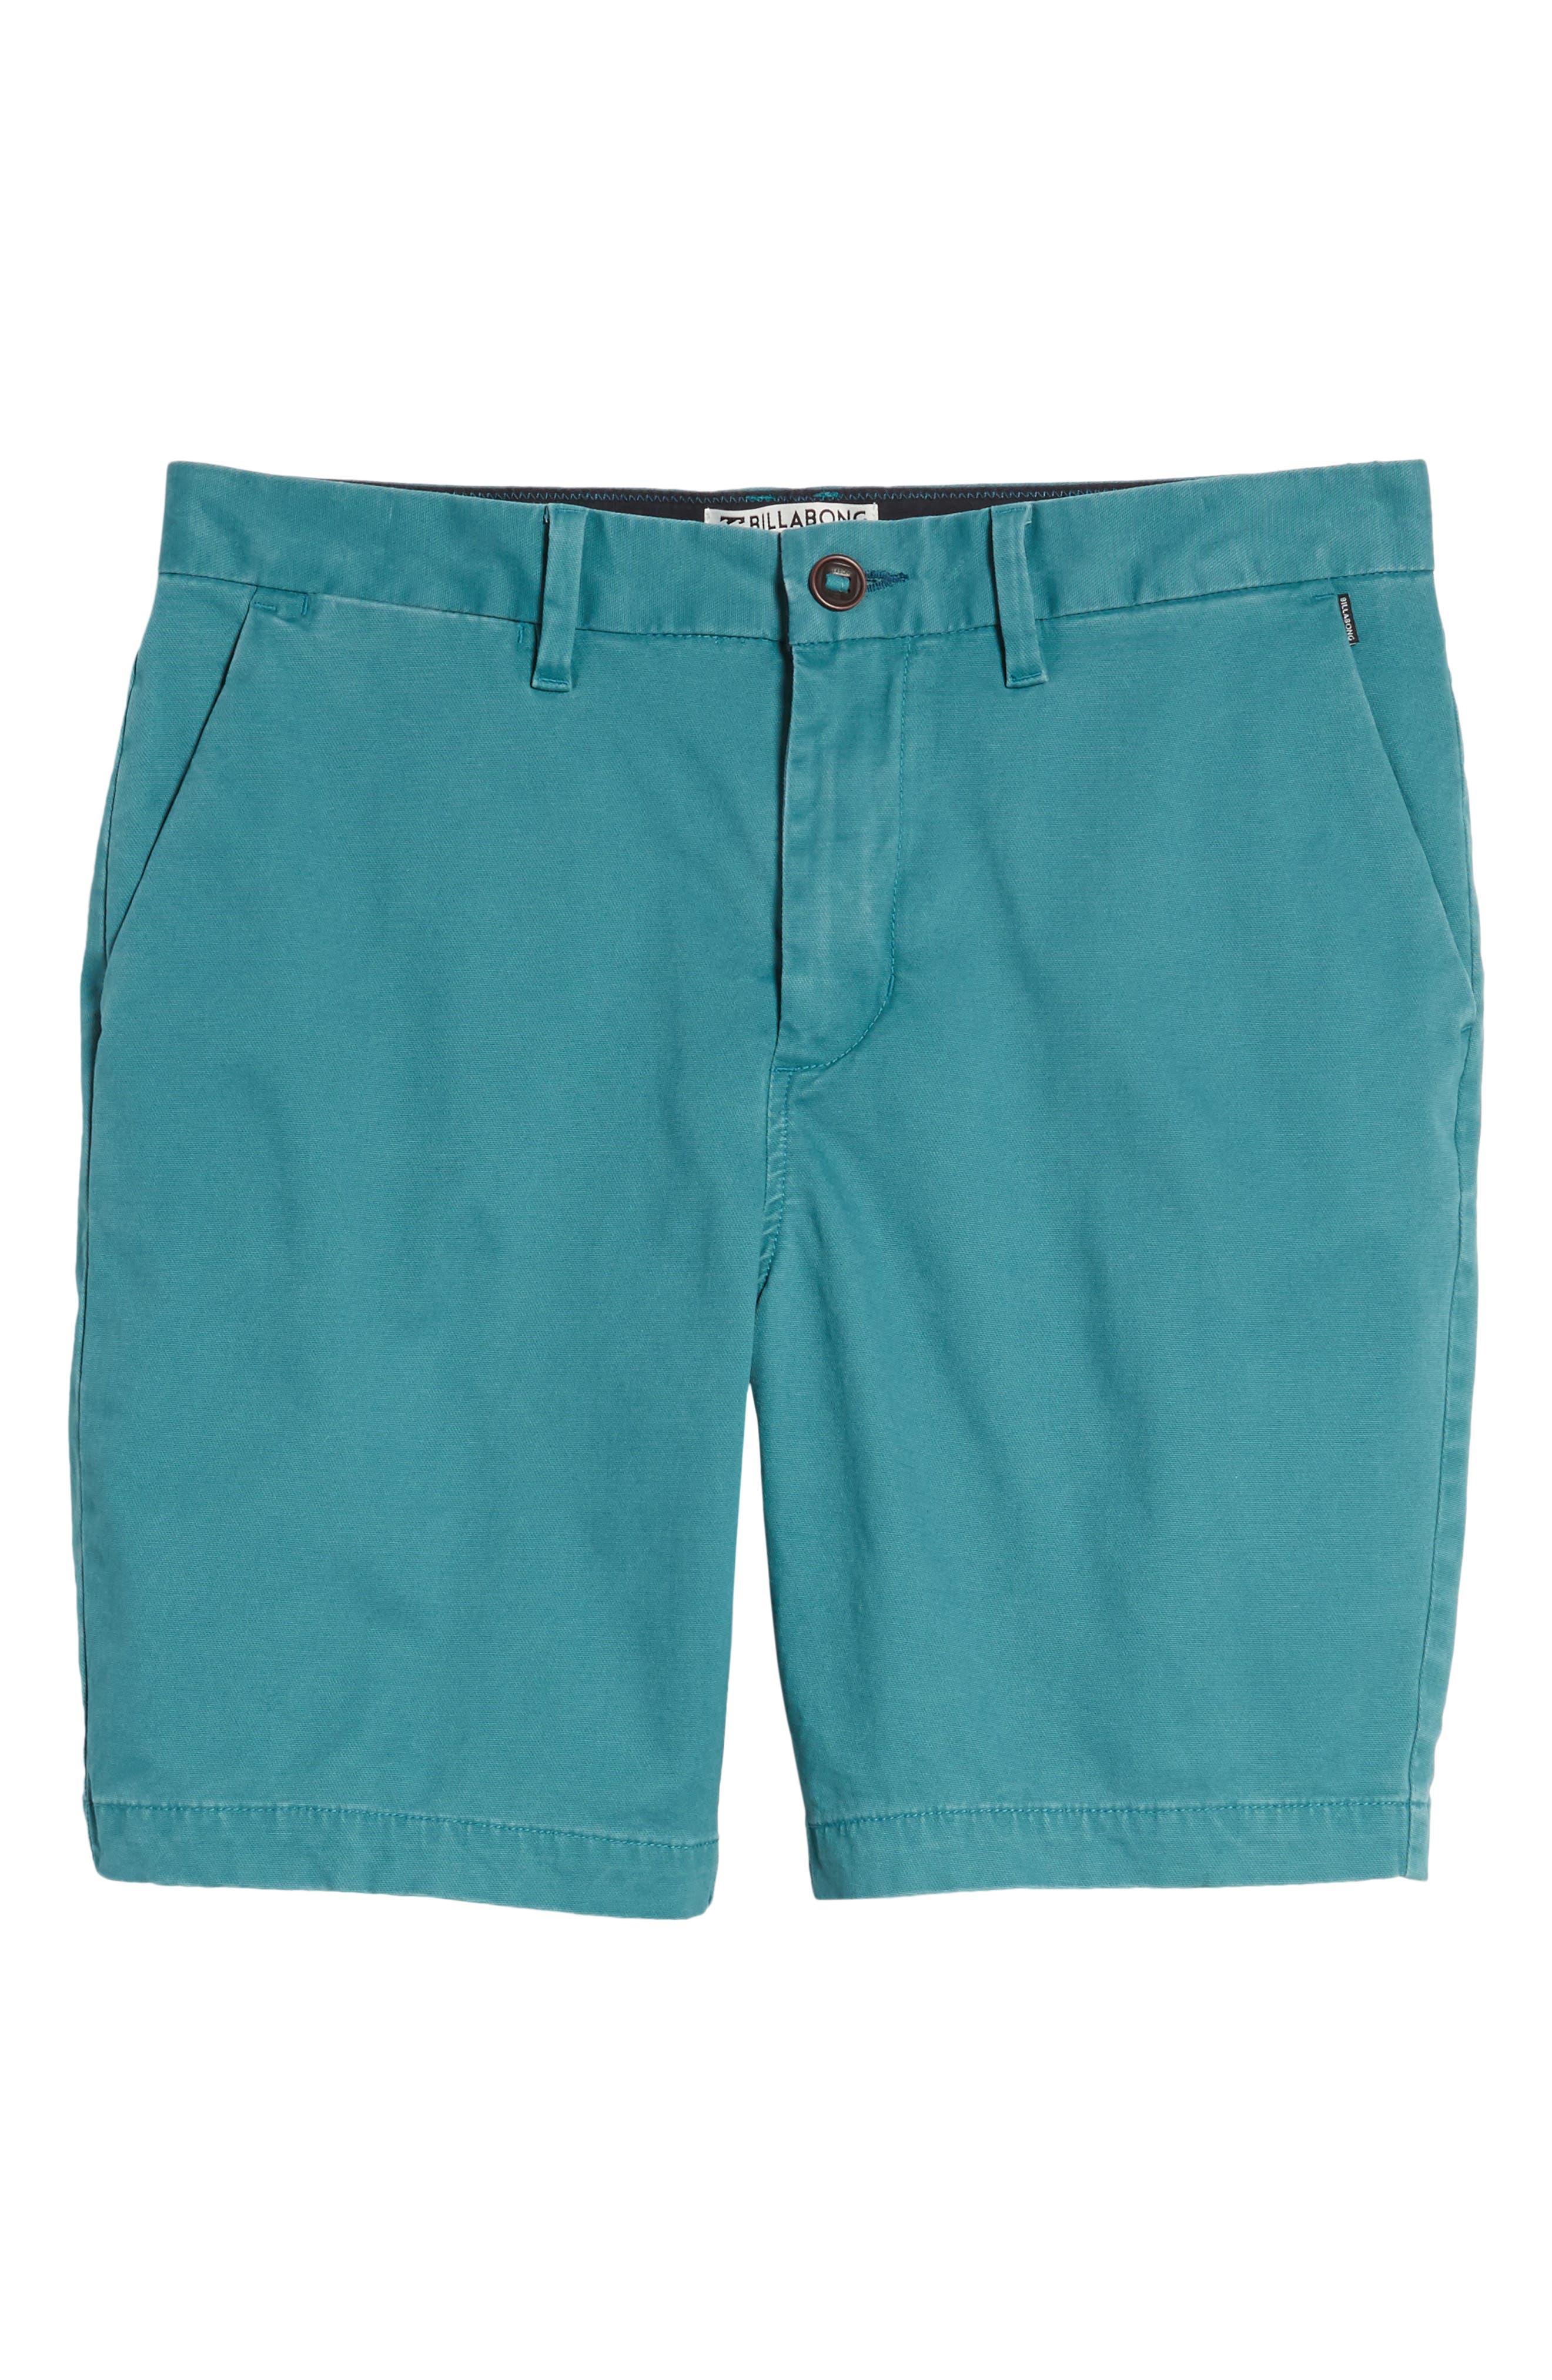 New Order Shorts,                             Alternate thumbnail 6, color,                             Hydro